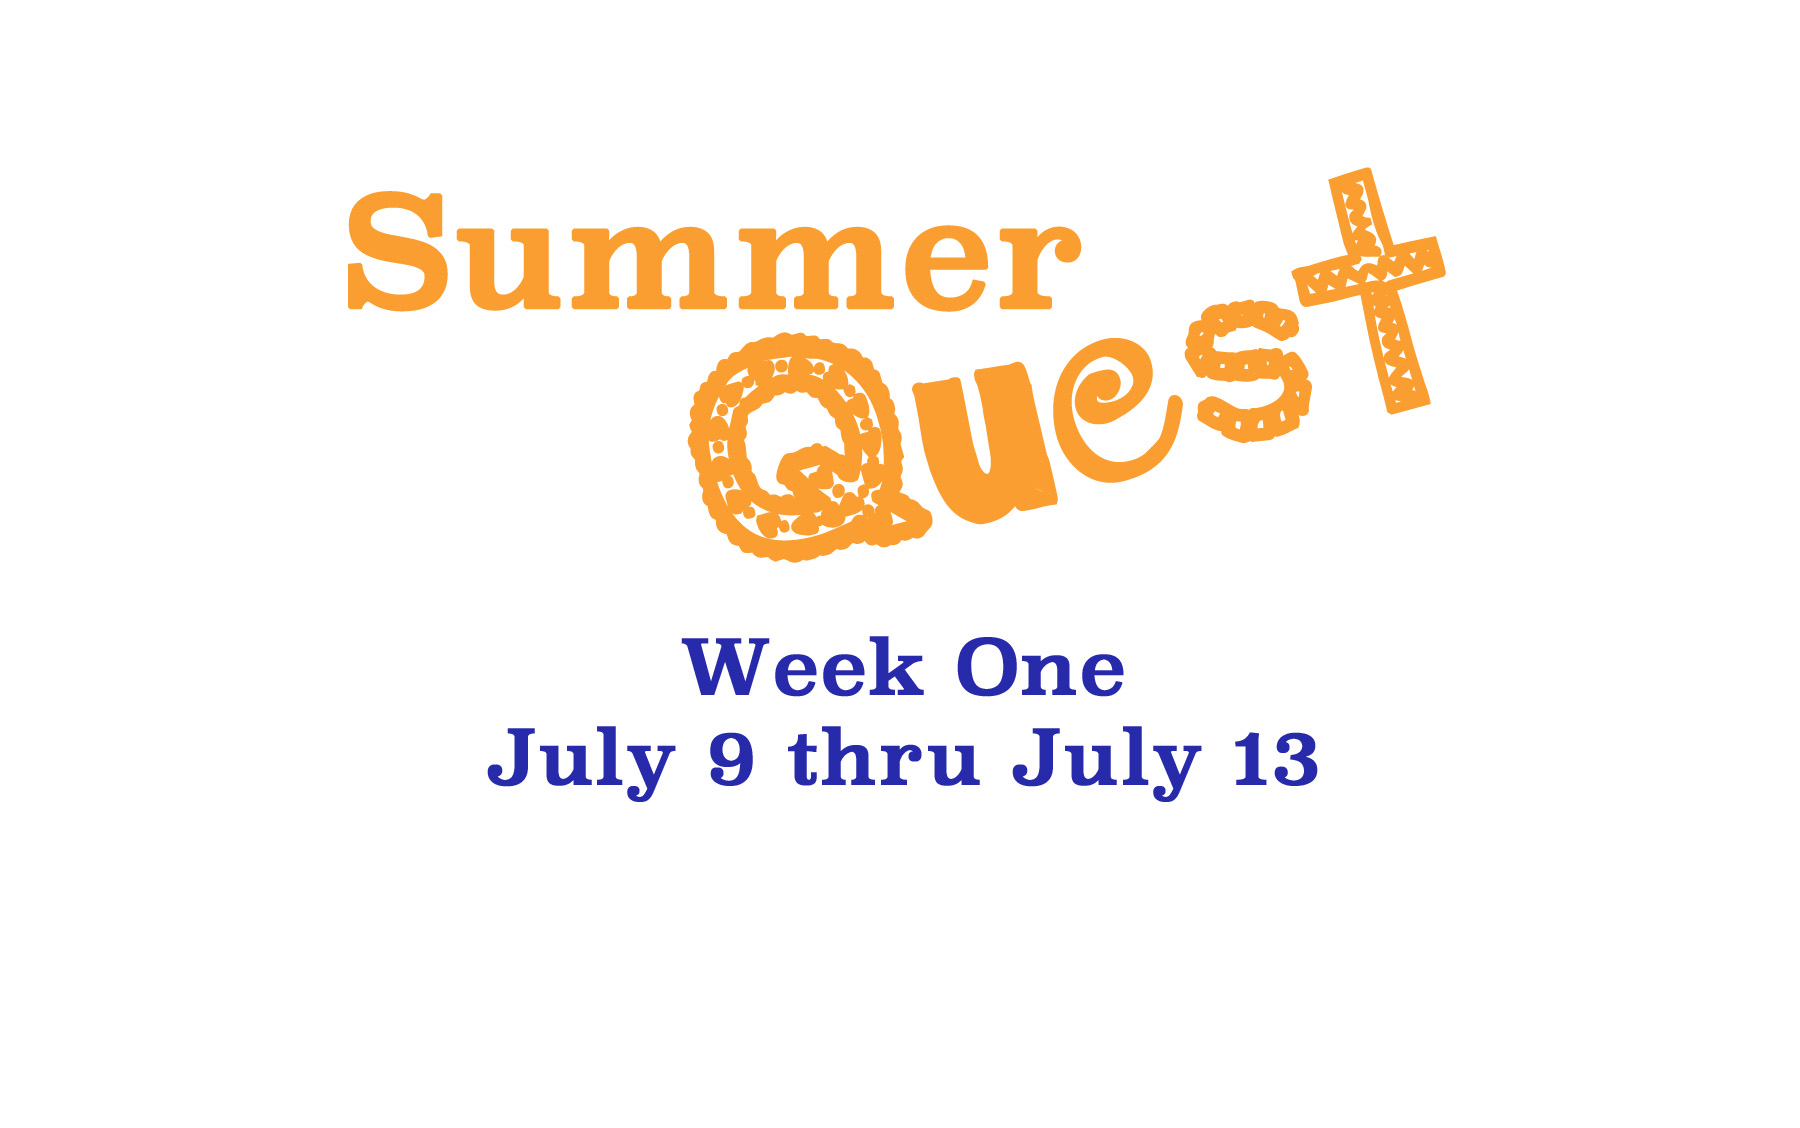 Summer Quest Logo_by week_wk1.jpg